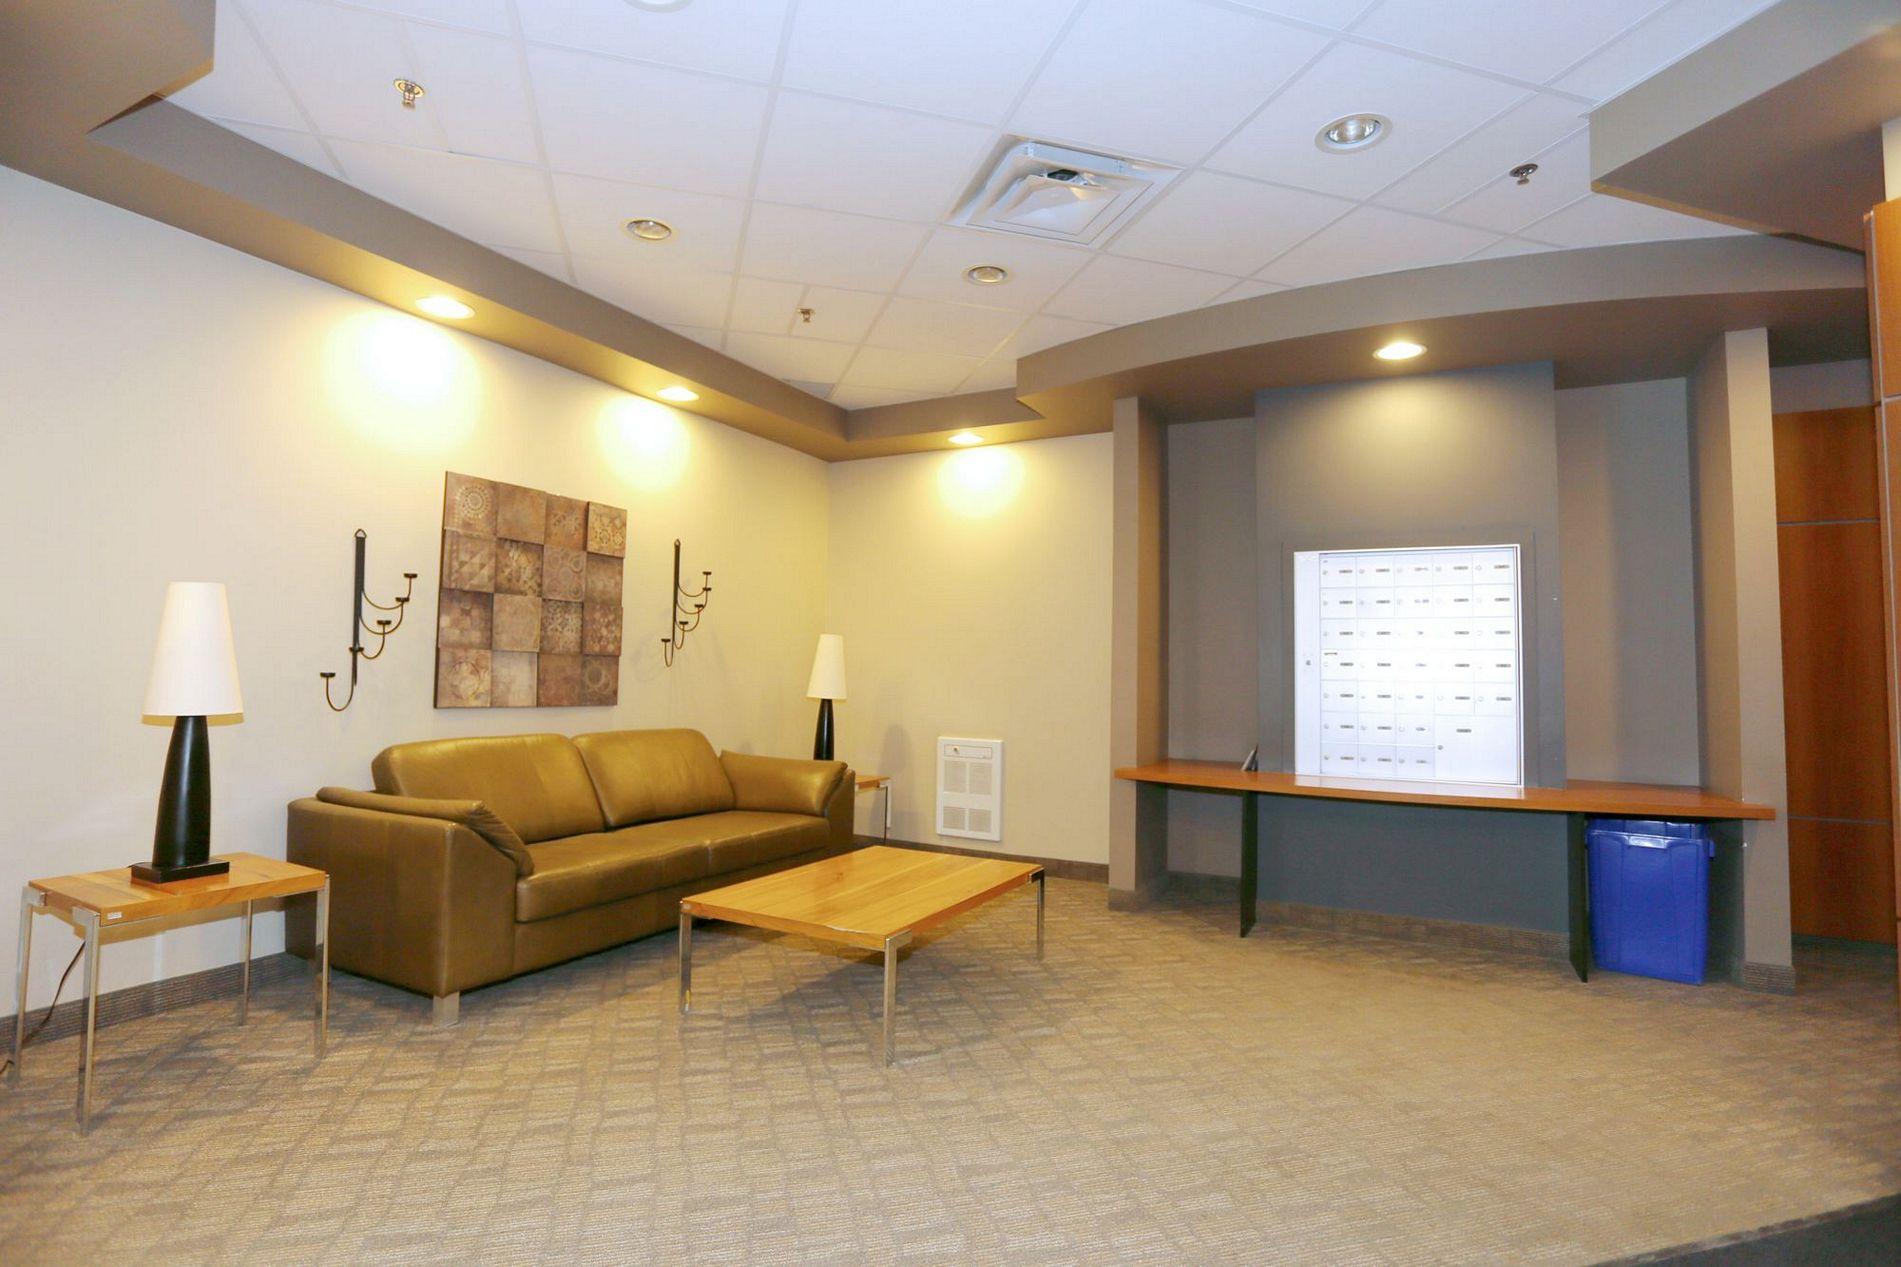 207-703 Riverwood Avenue, Winnipeg, Manitoba  R3T 1V6 - Photo 2 - 1519968